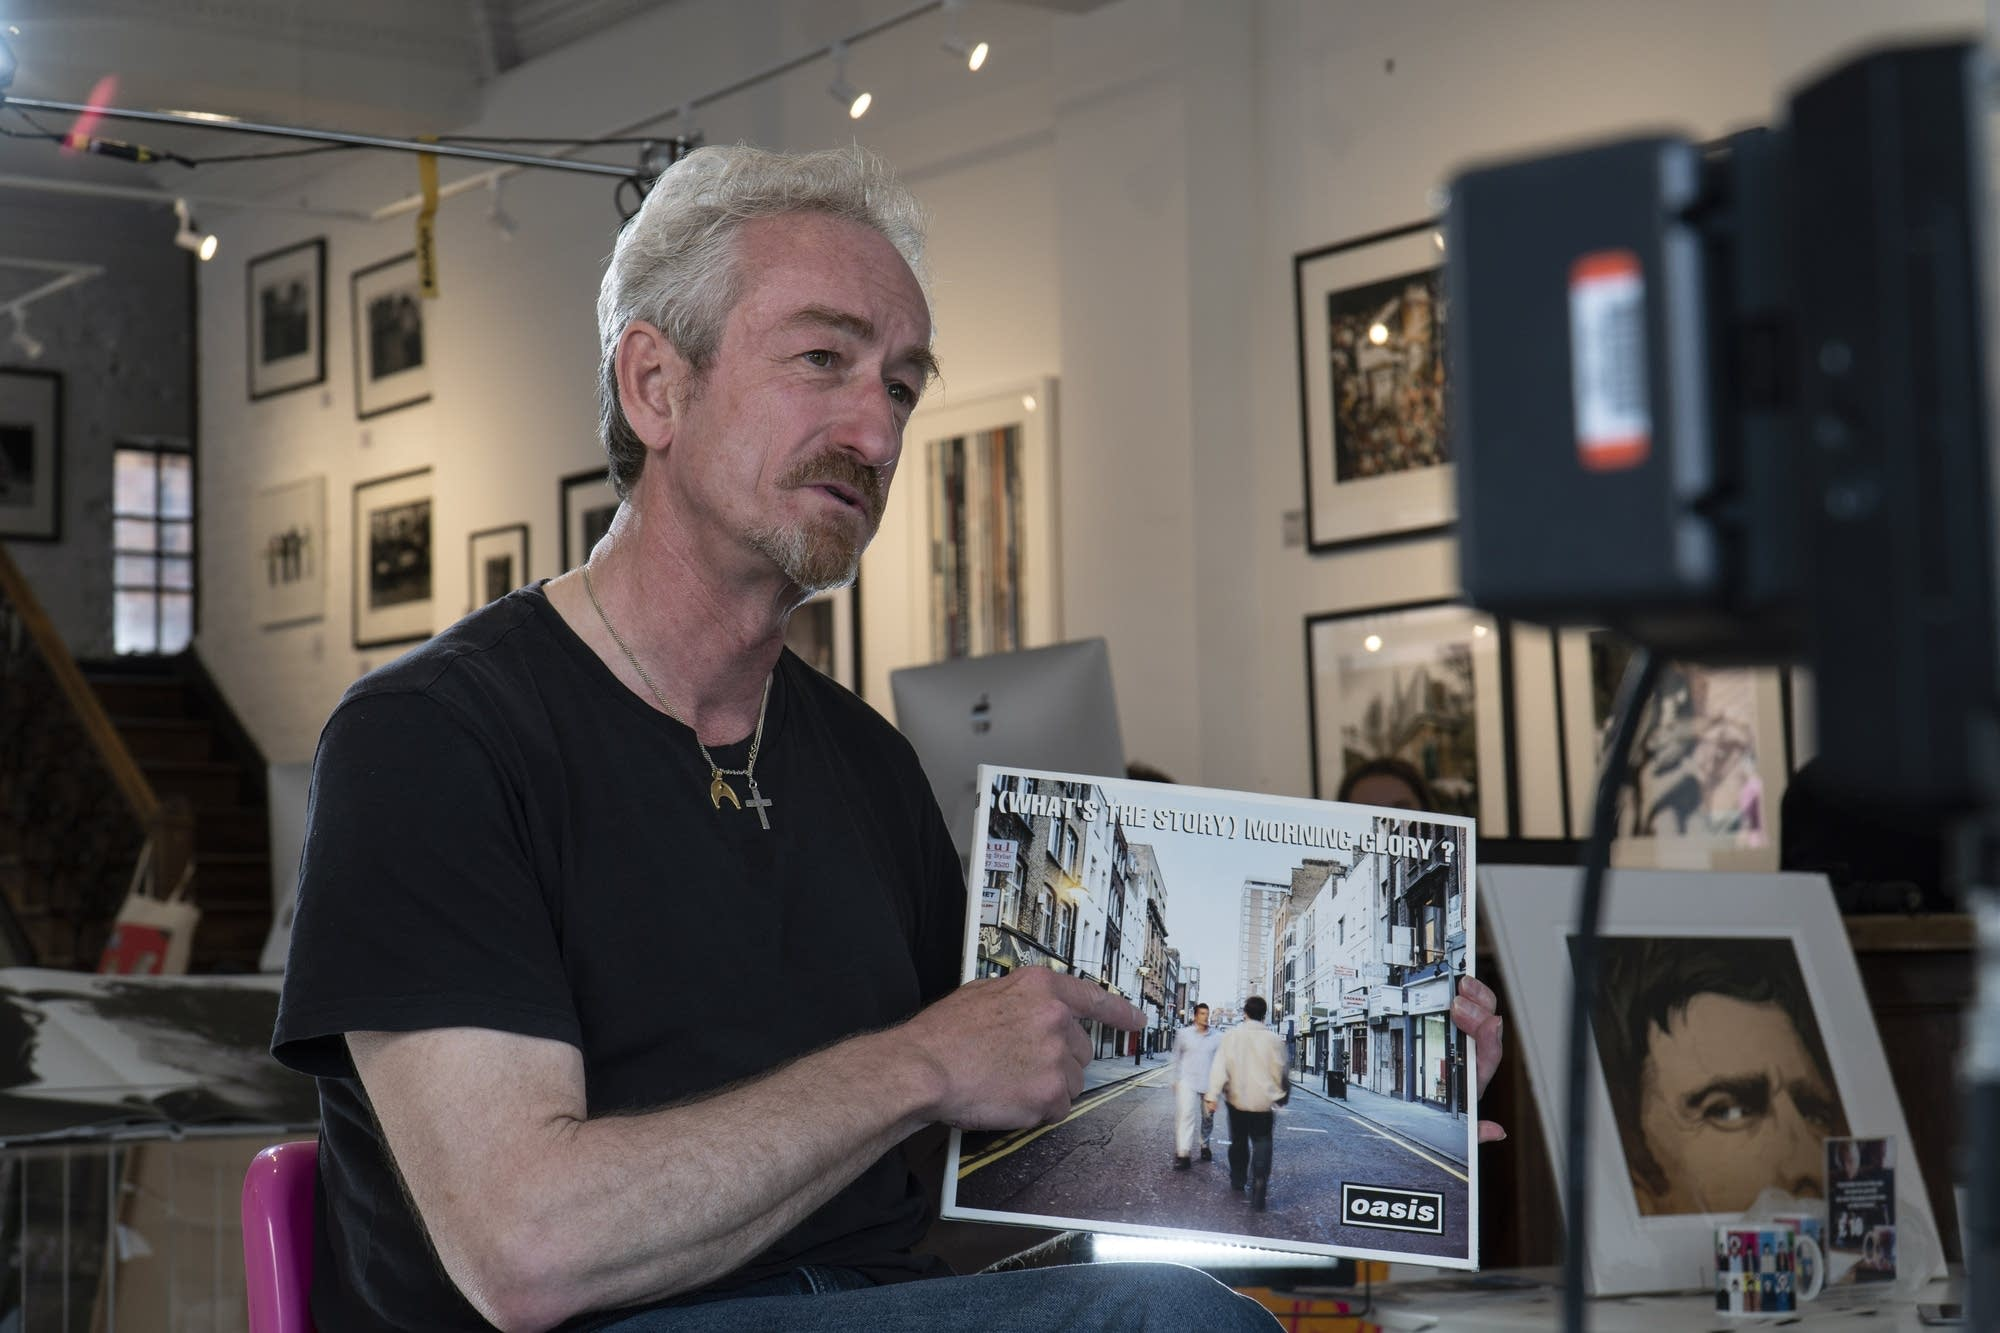 Photographer Michael Spencer Jones